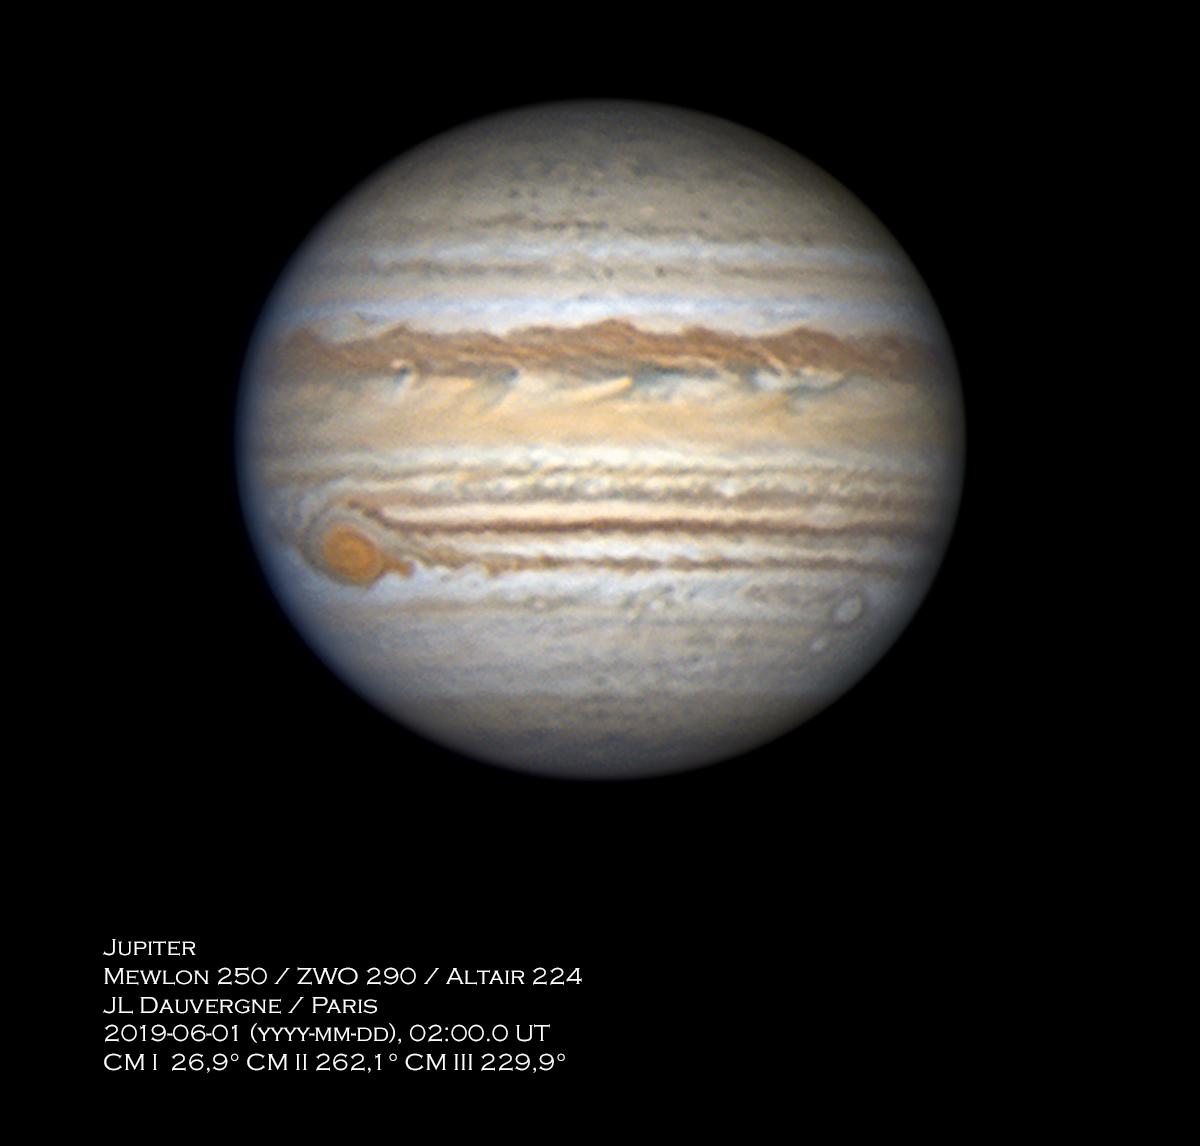 2019-06-01-0200_0-LL-Jupiter_ALTAIRGP224C_lapl6_ap119.png.jpg.160a63f48b6a50245bab883f42ff4394.jpg